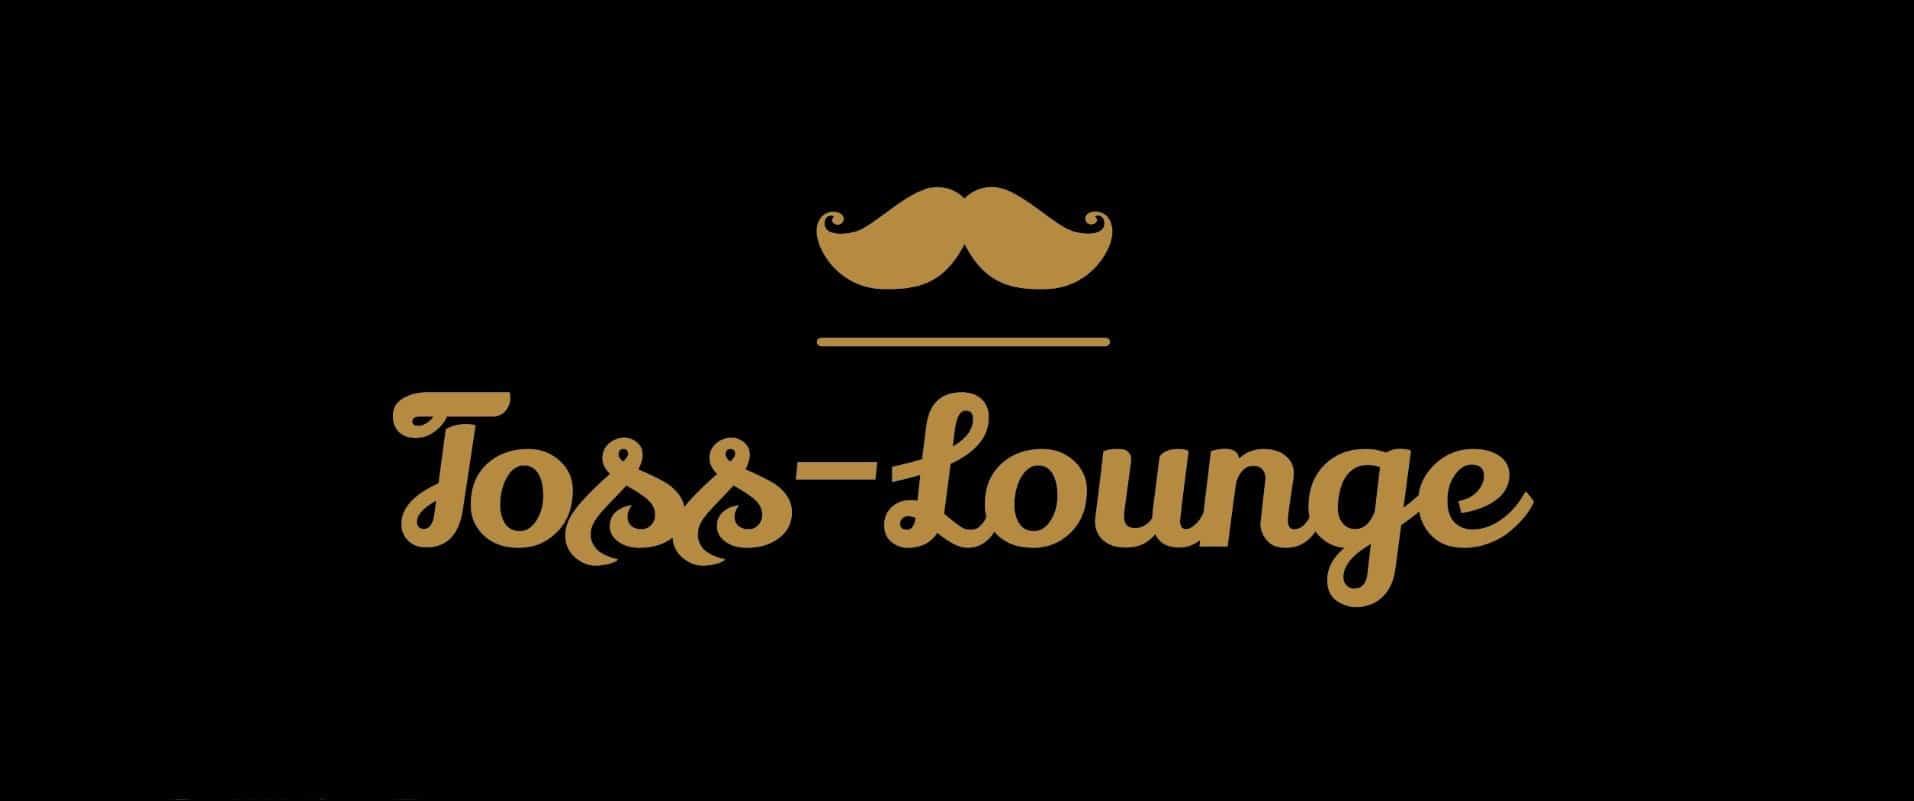 Toss Lounge